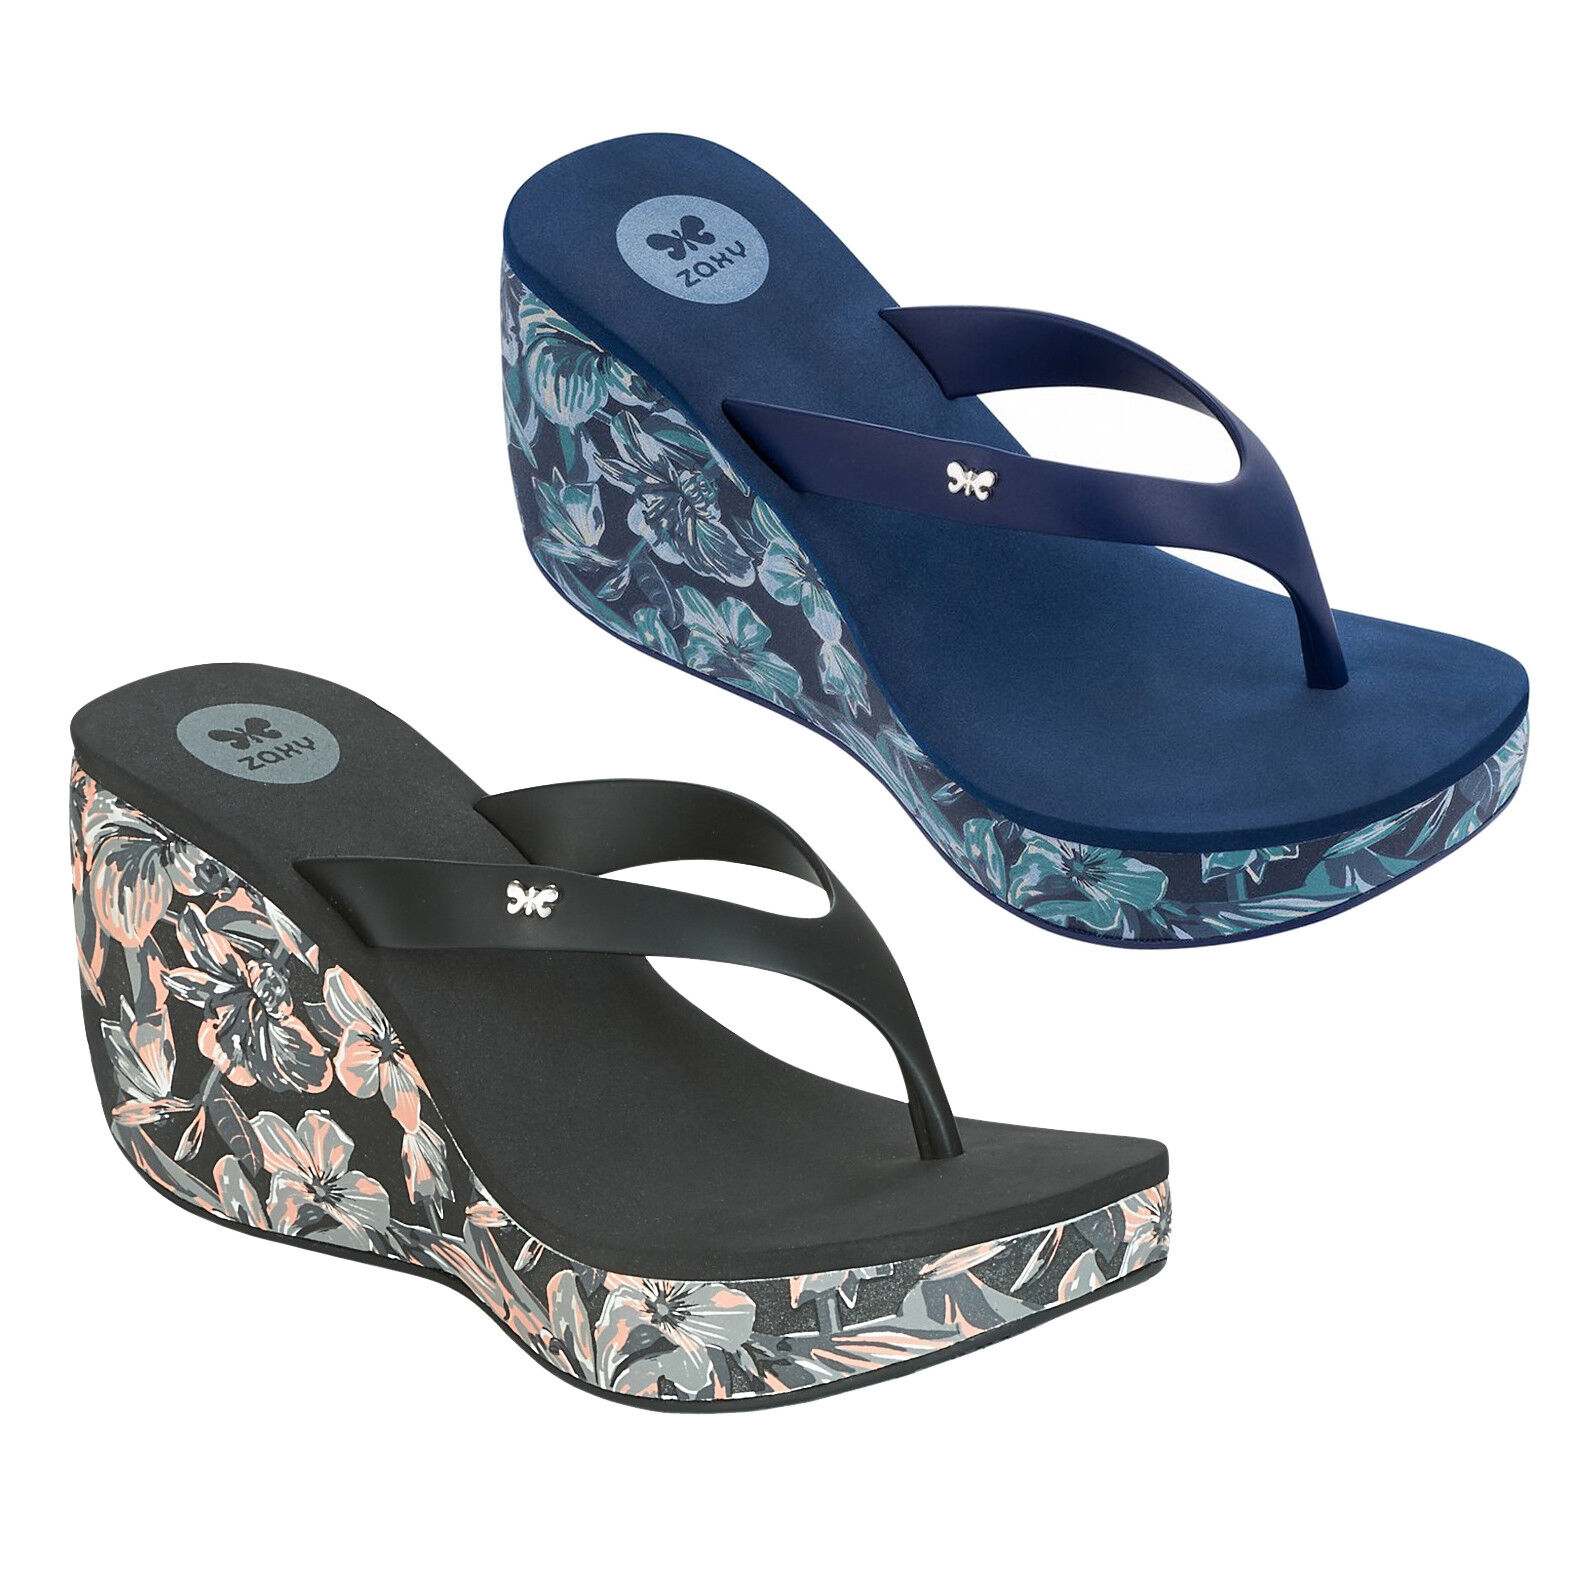 ZAXY zapatillas mujer cuña cm 8 Lipstick VI Fem Fem Fem 82296 HECHO EN BRASIL  tienda en linea